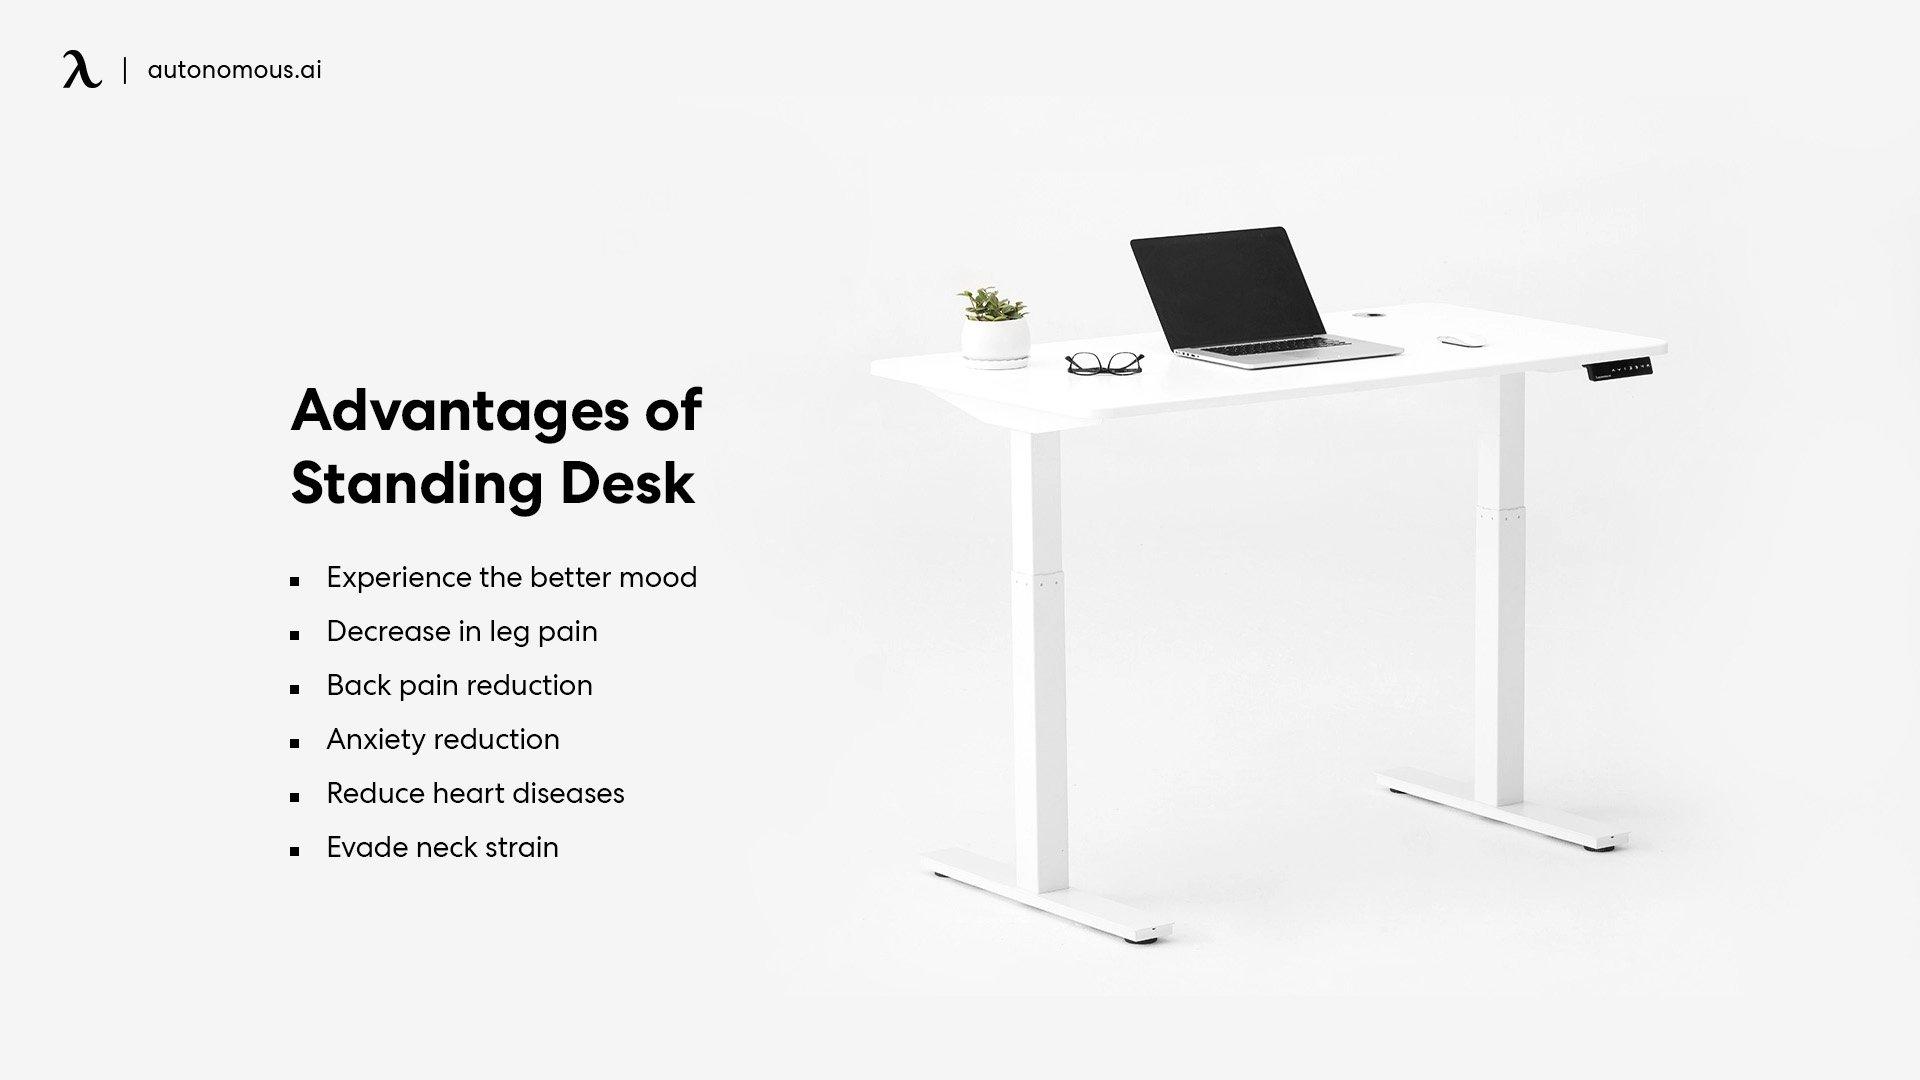 Advantages of Standing desk